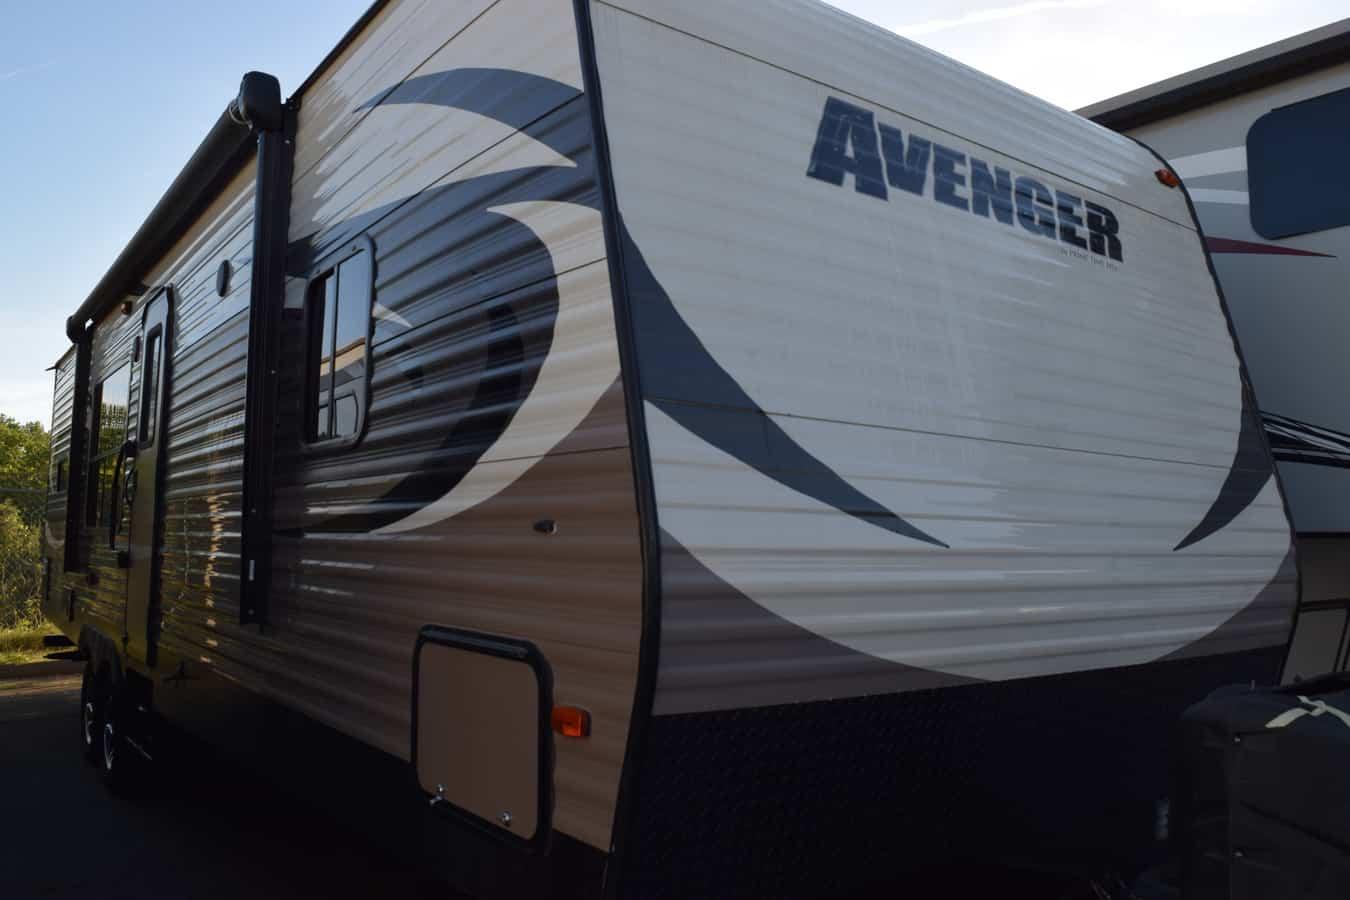 USED 2015 Prime Time AVENGER AVT28RKS - Three Way Campers